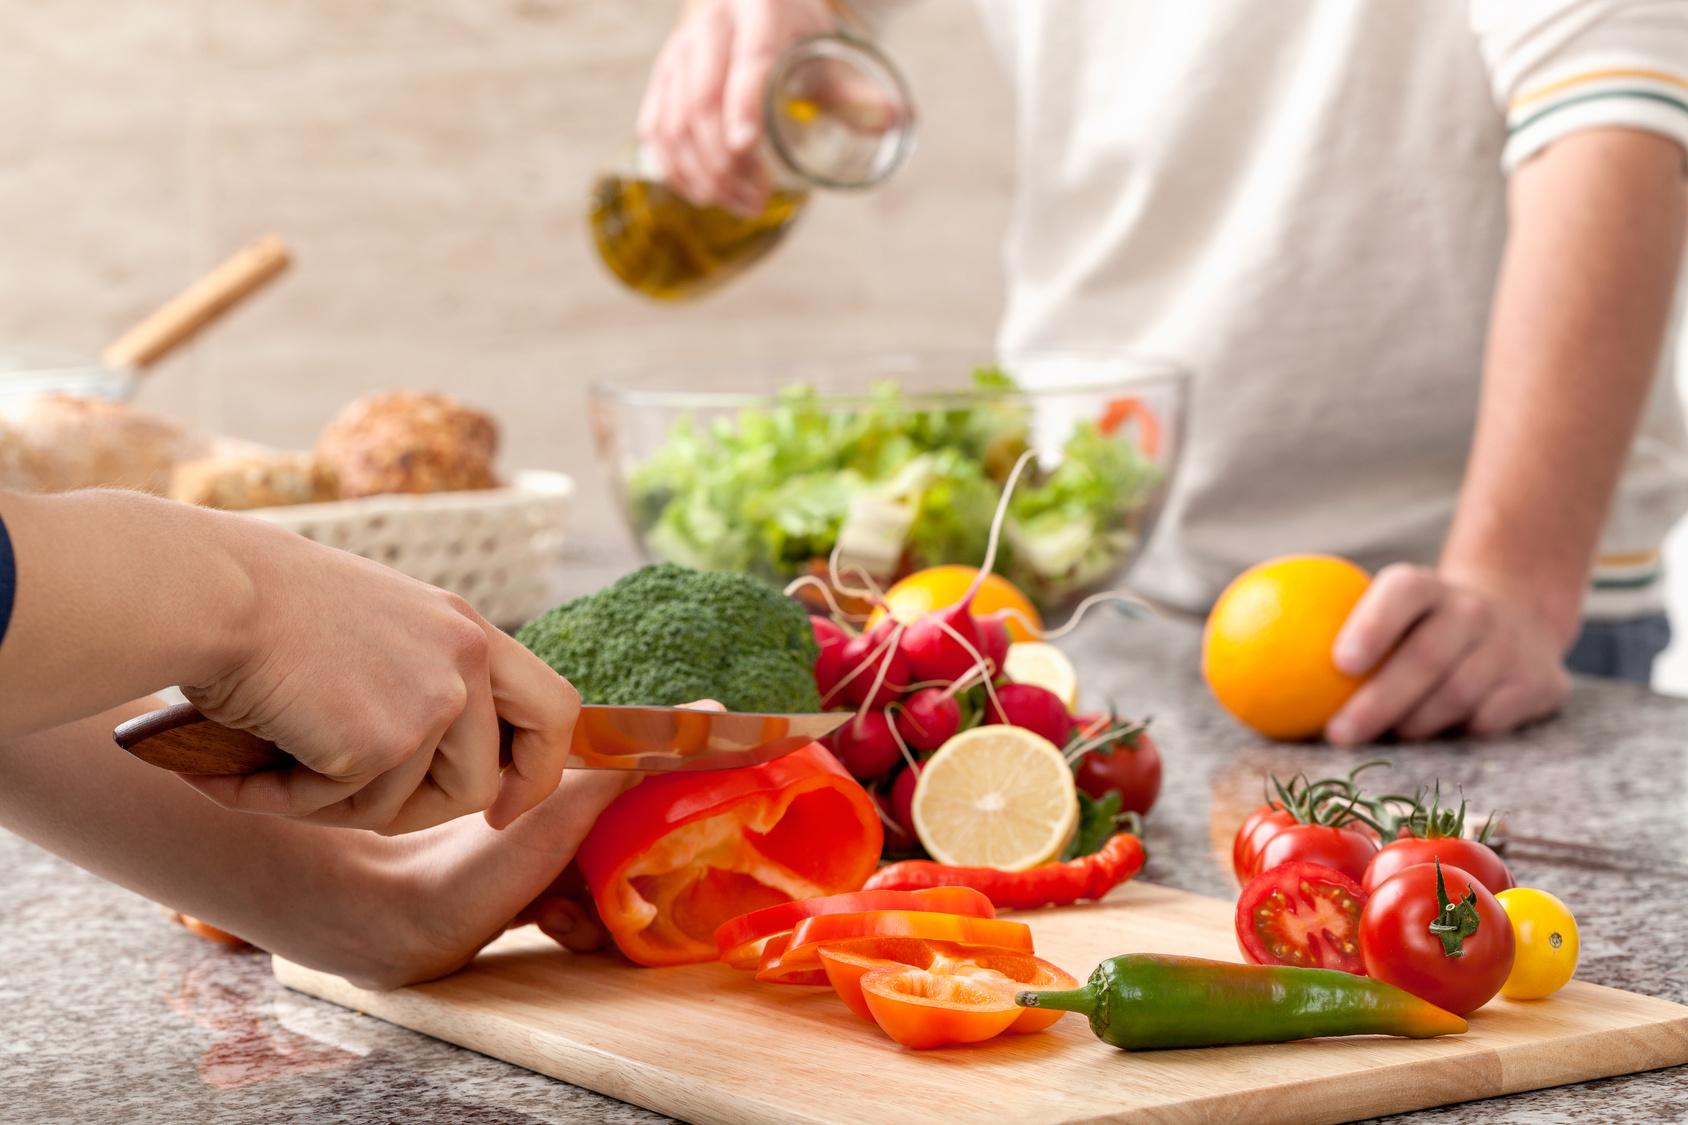 gesunde Lebensmittel zum Kochen